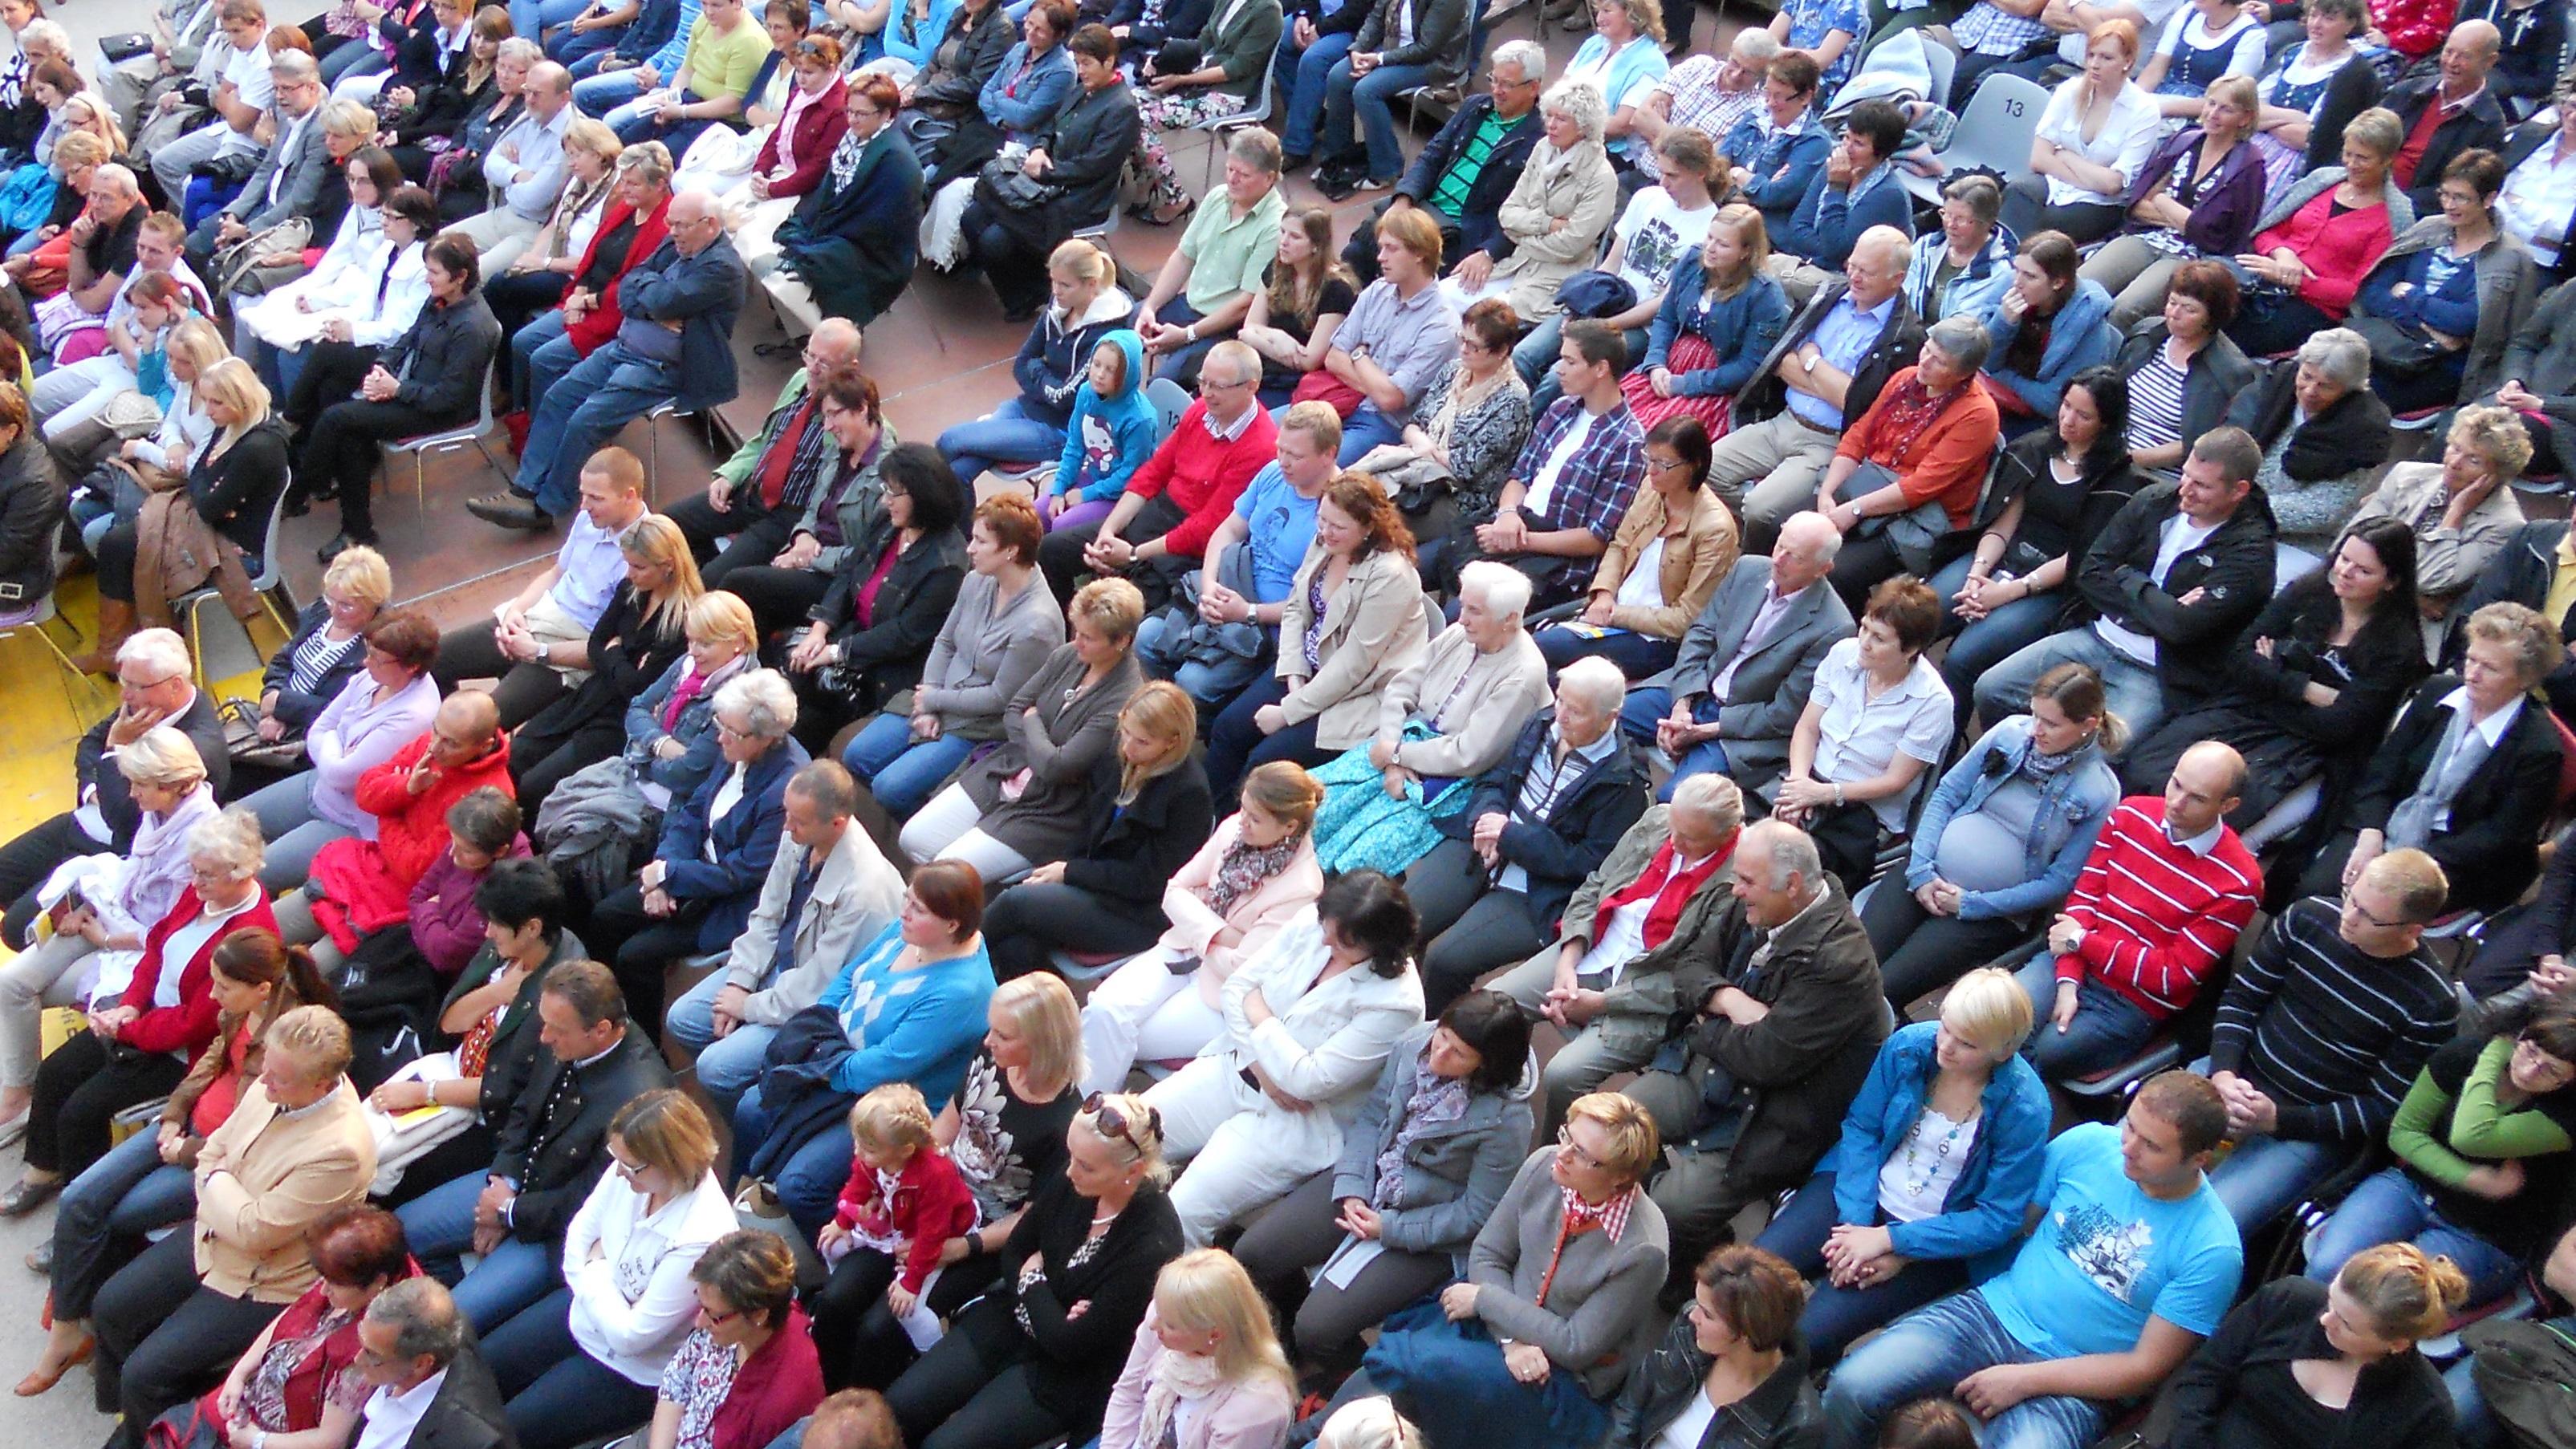 Publikum. Foto: Volksbuehne, CC-BY-SA-3.0